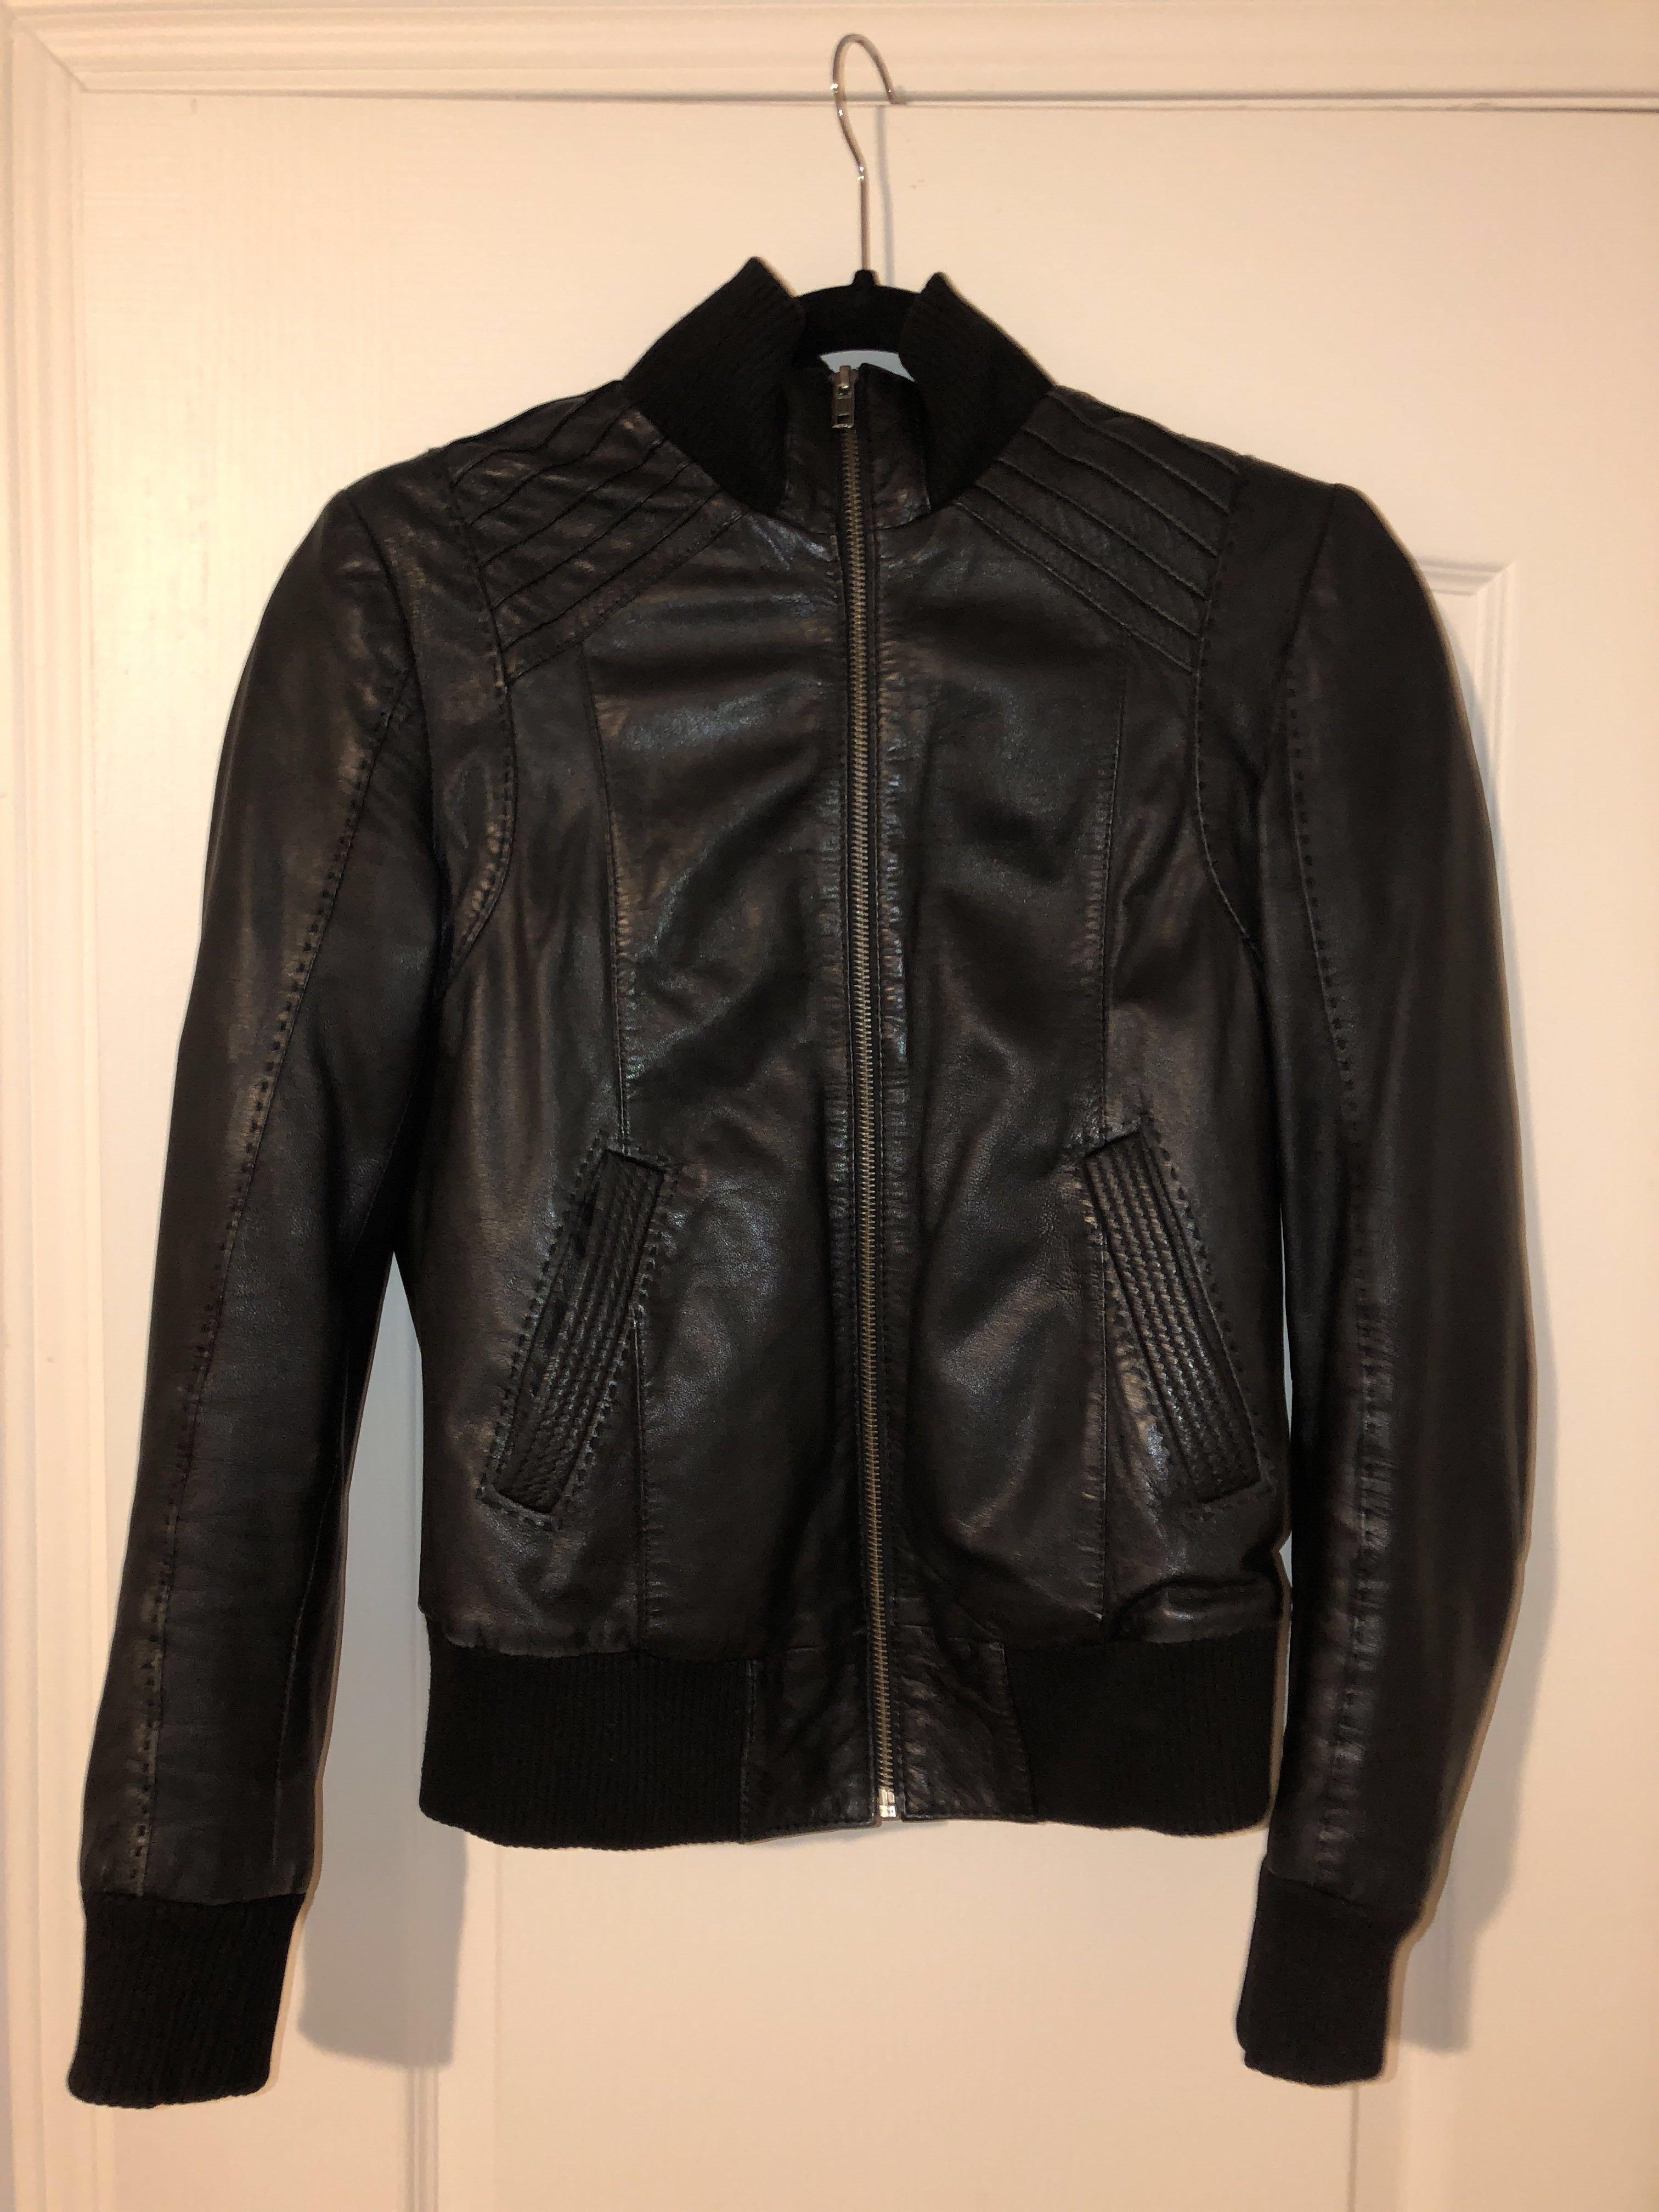 Daniel leather jacket size XS & Free unopened Essie nail polish